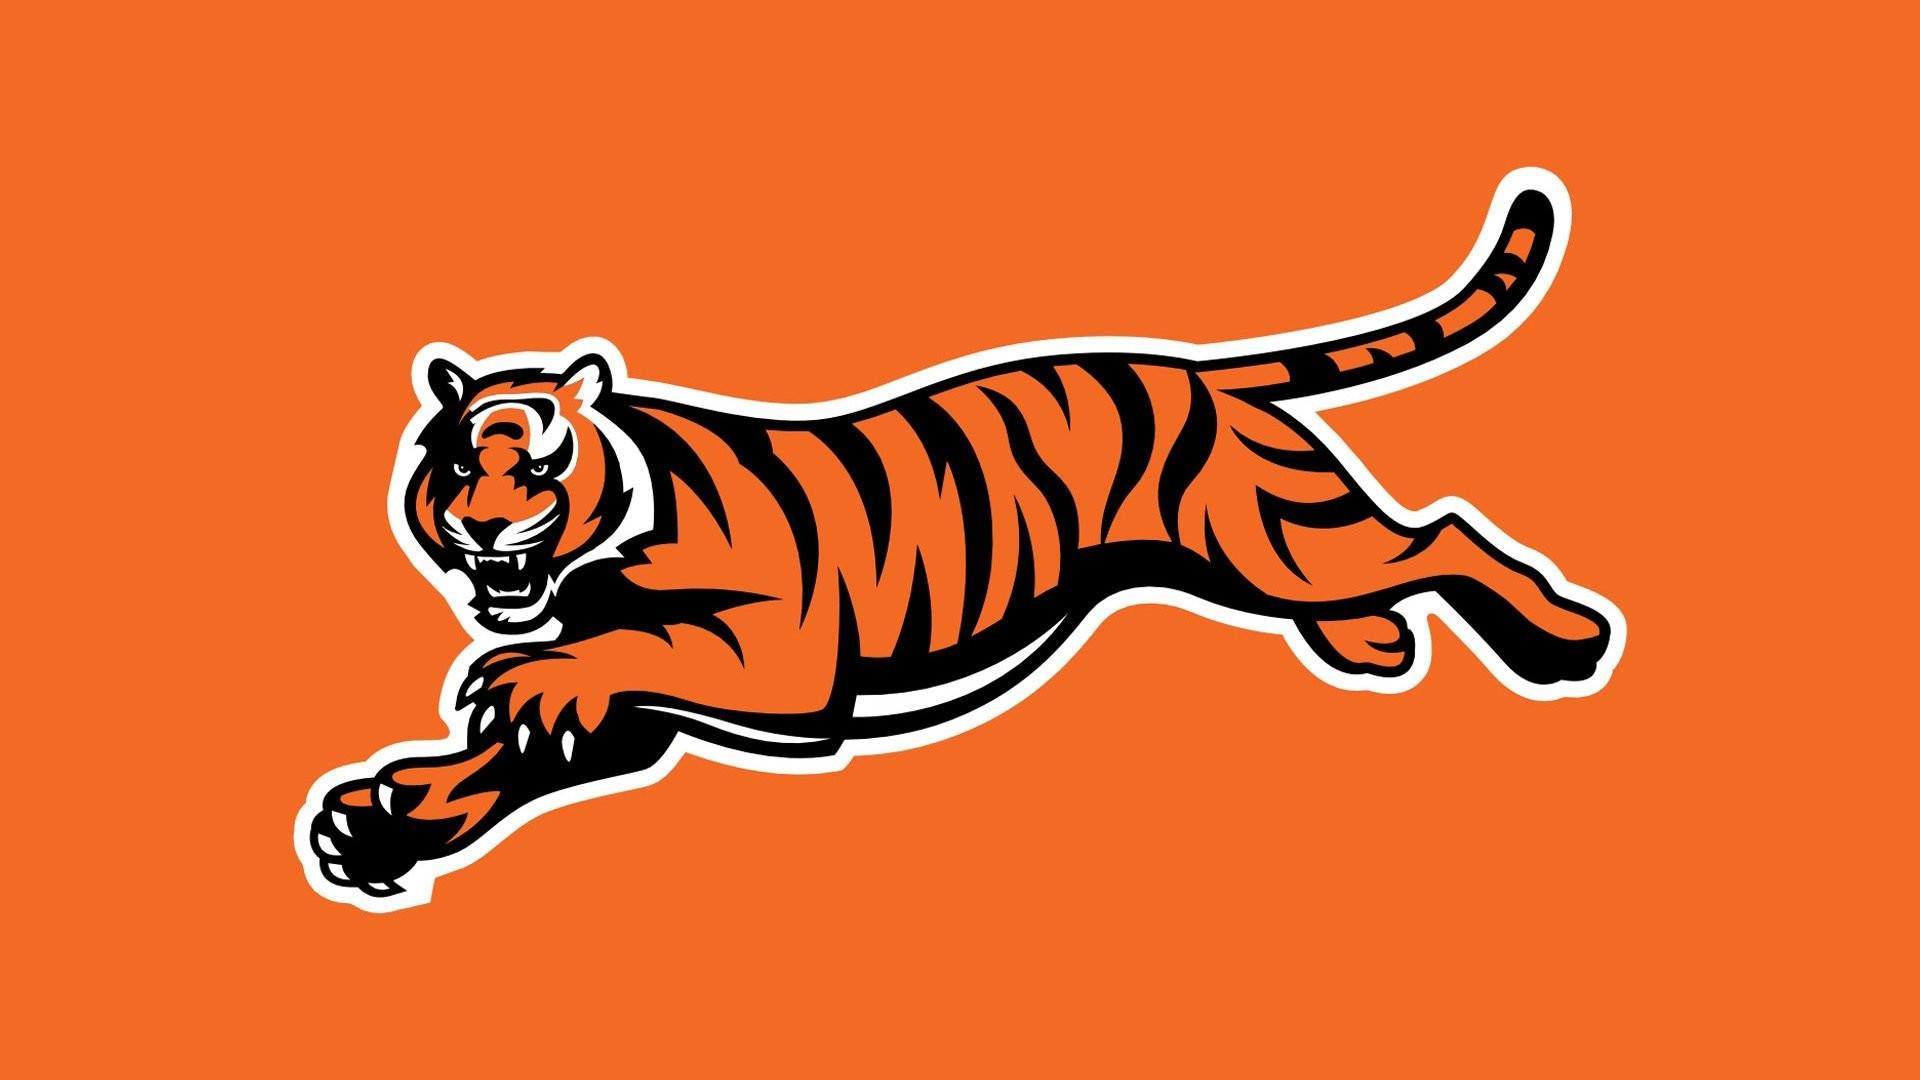 HD Wallpaper   Background ID:248698. Sports Cincinnati Bengals